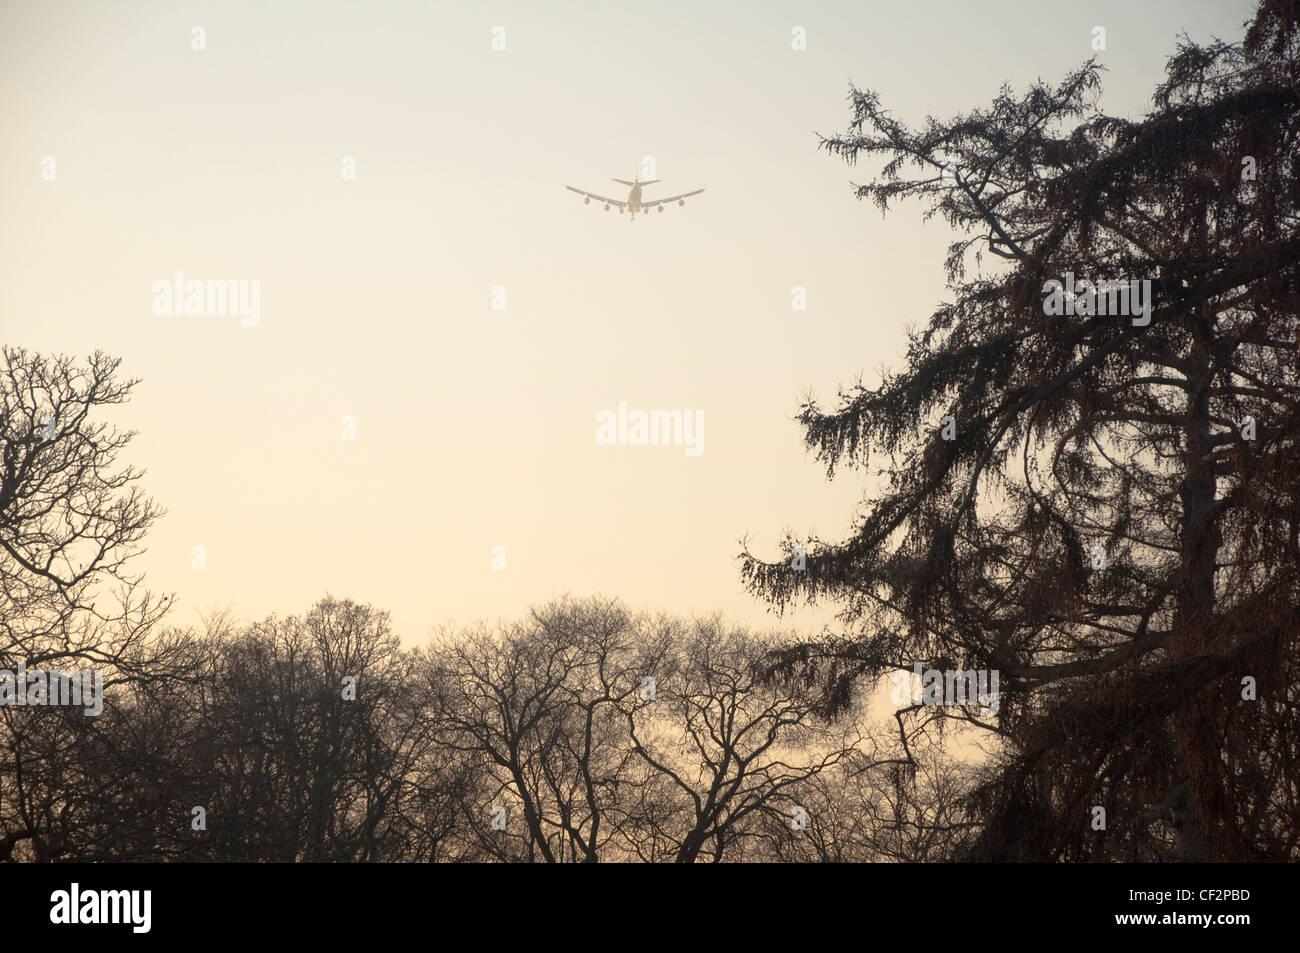 Aeroplane flying over Kew Gardens at dusk - descending towards Heathrow Airport. London, UK. - Stock Image